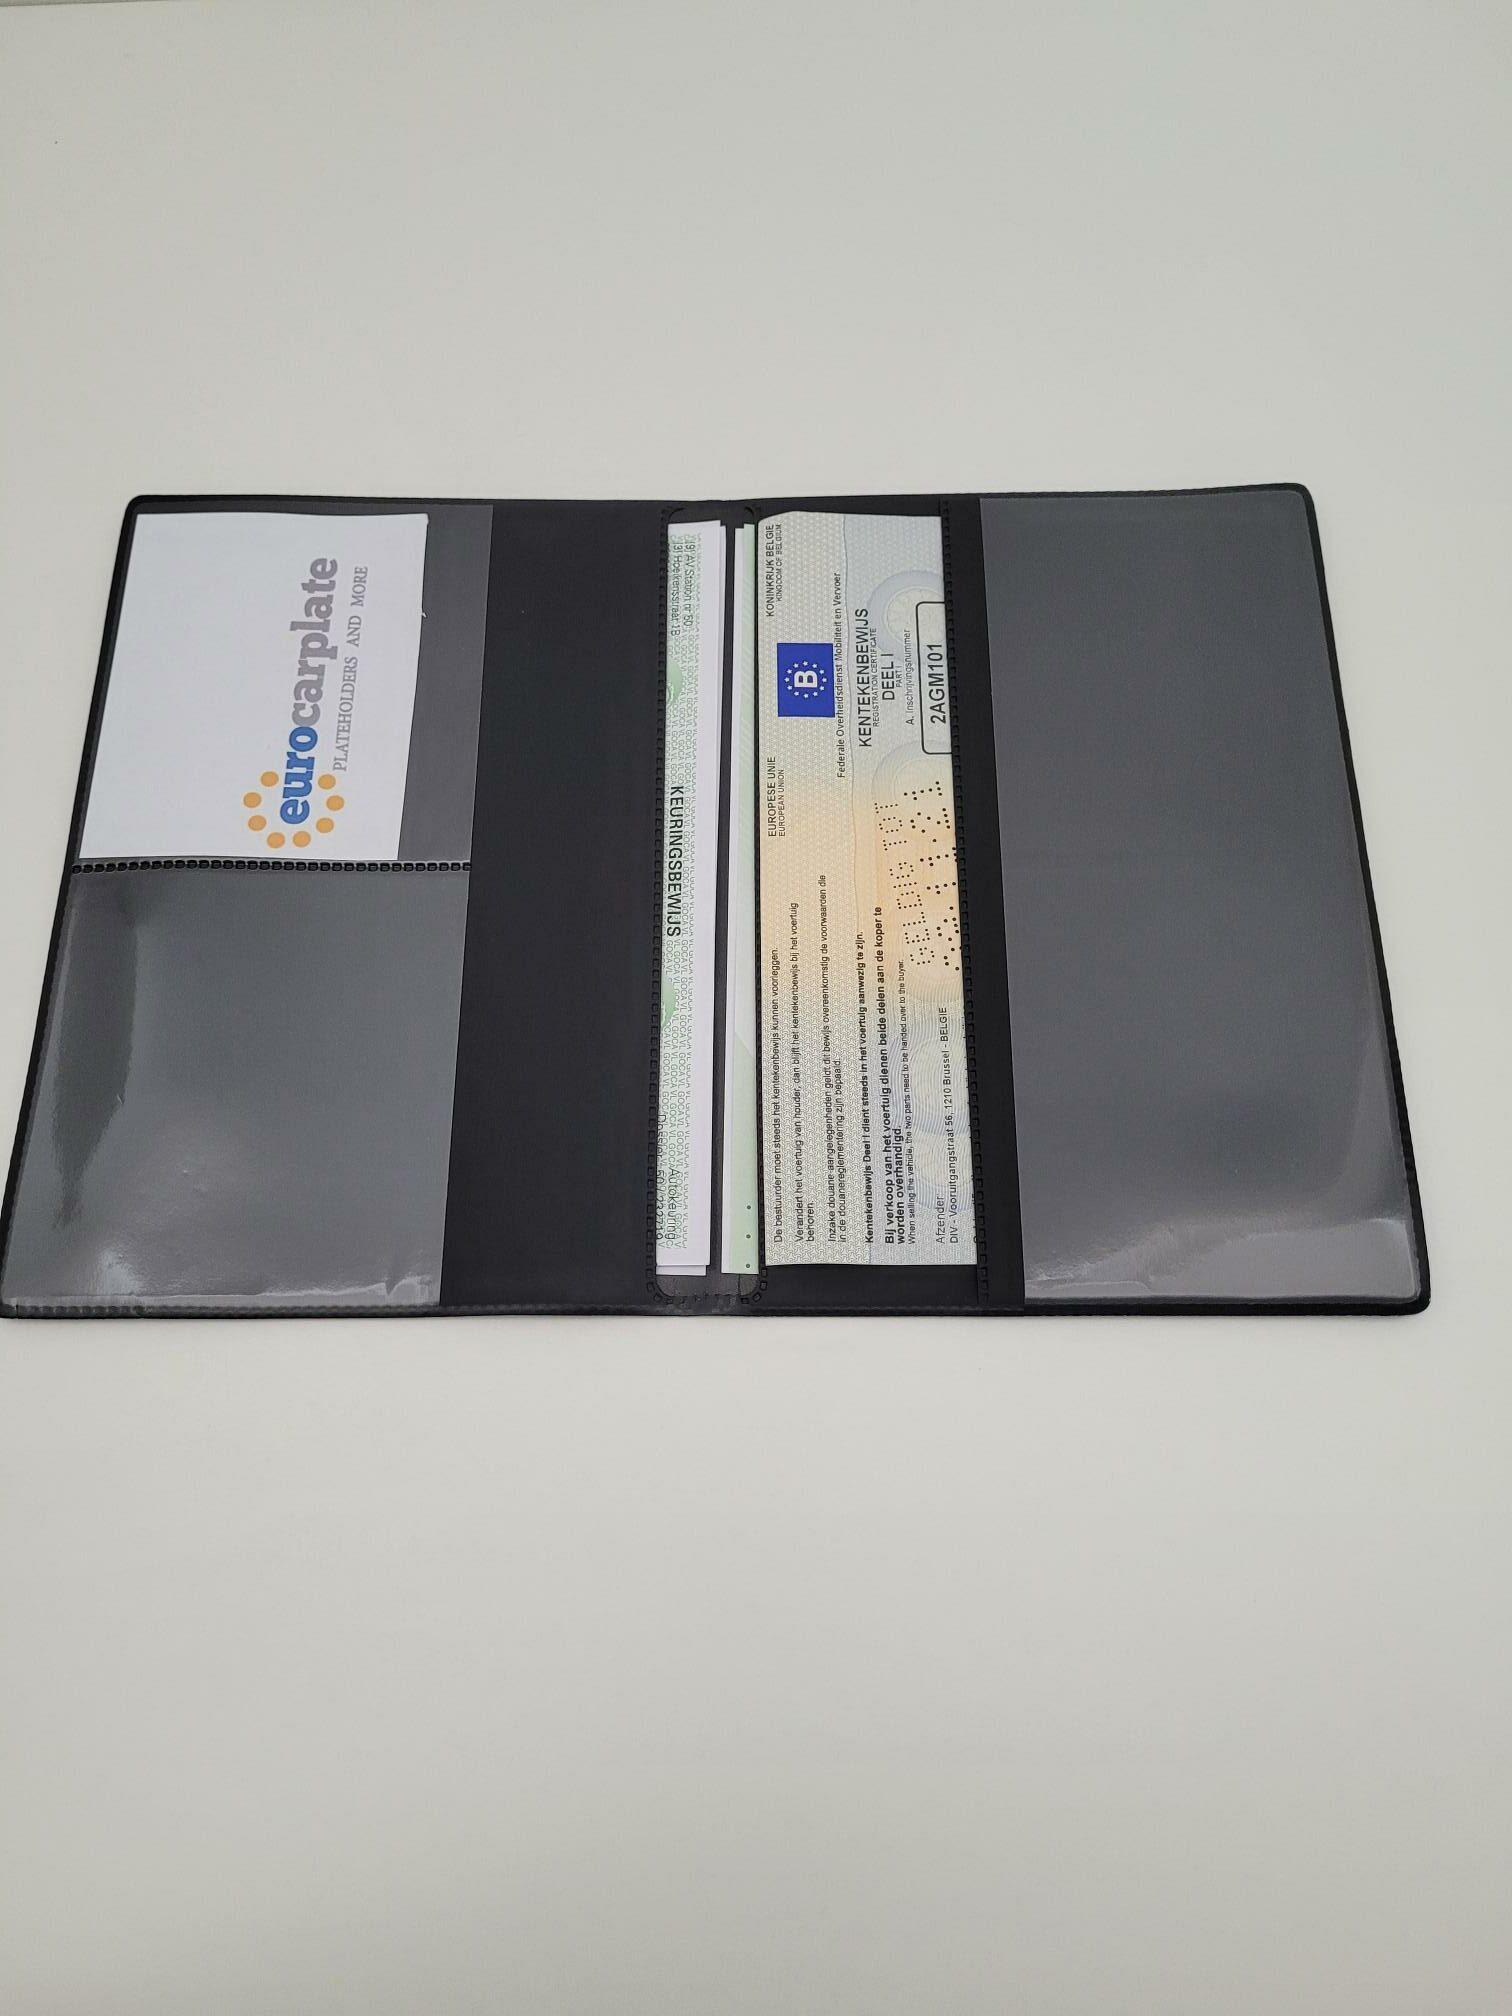 auto documentmap pro gomme binnenkant